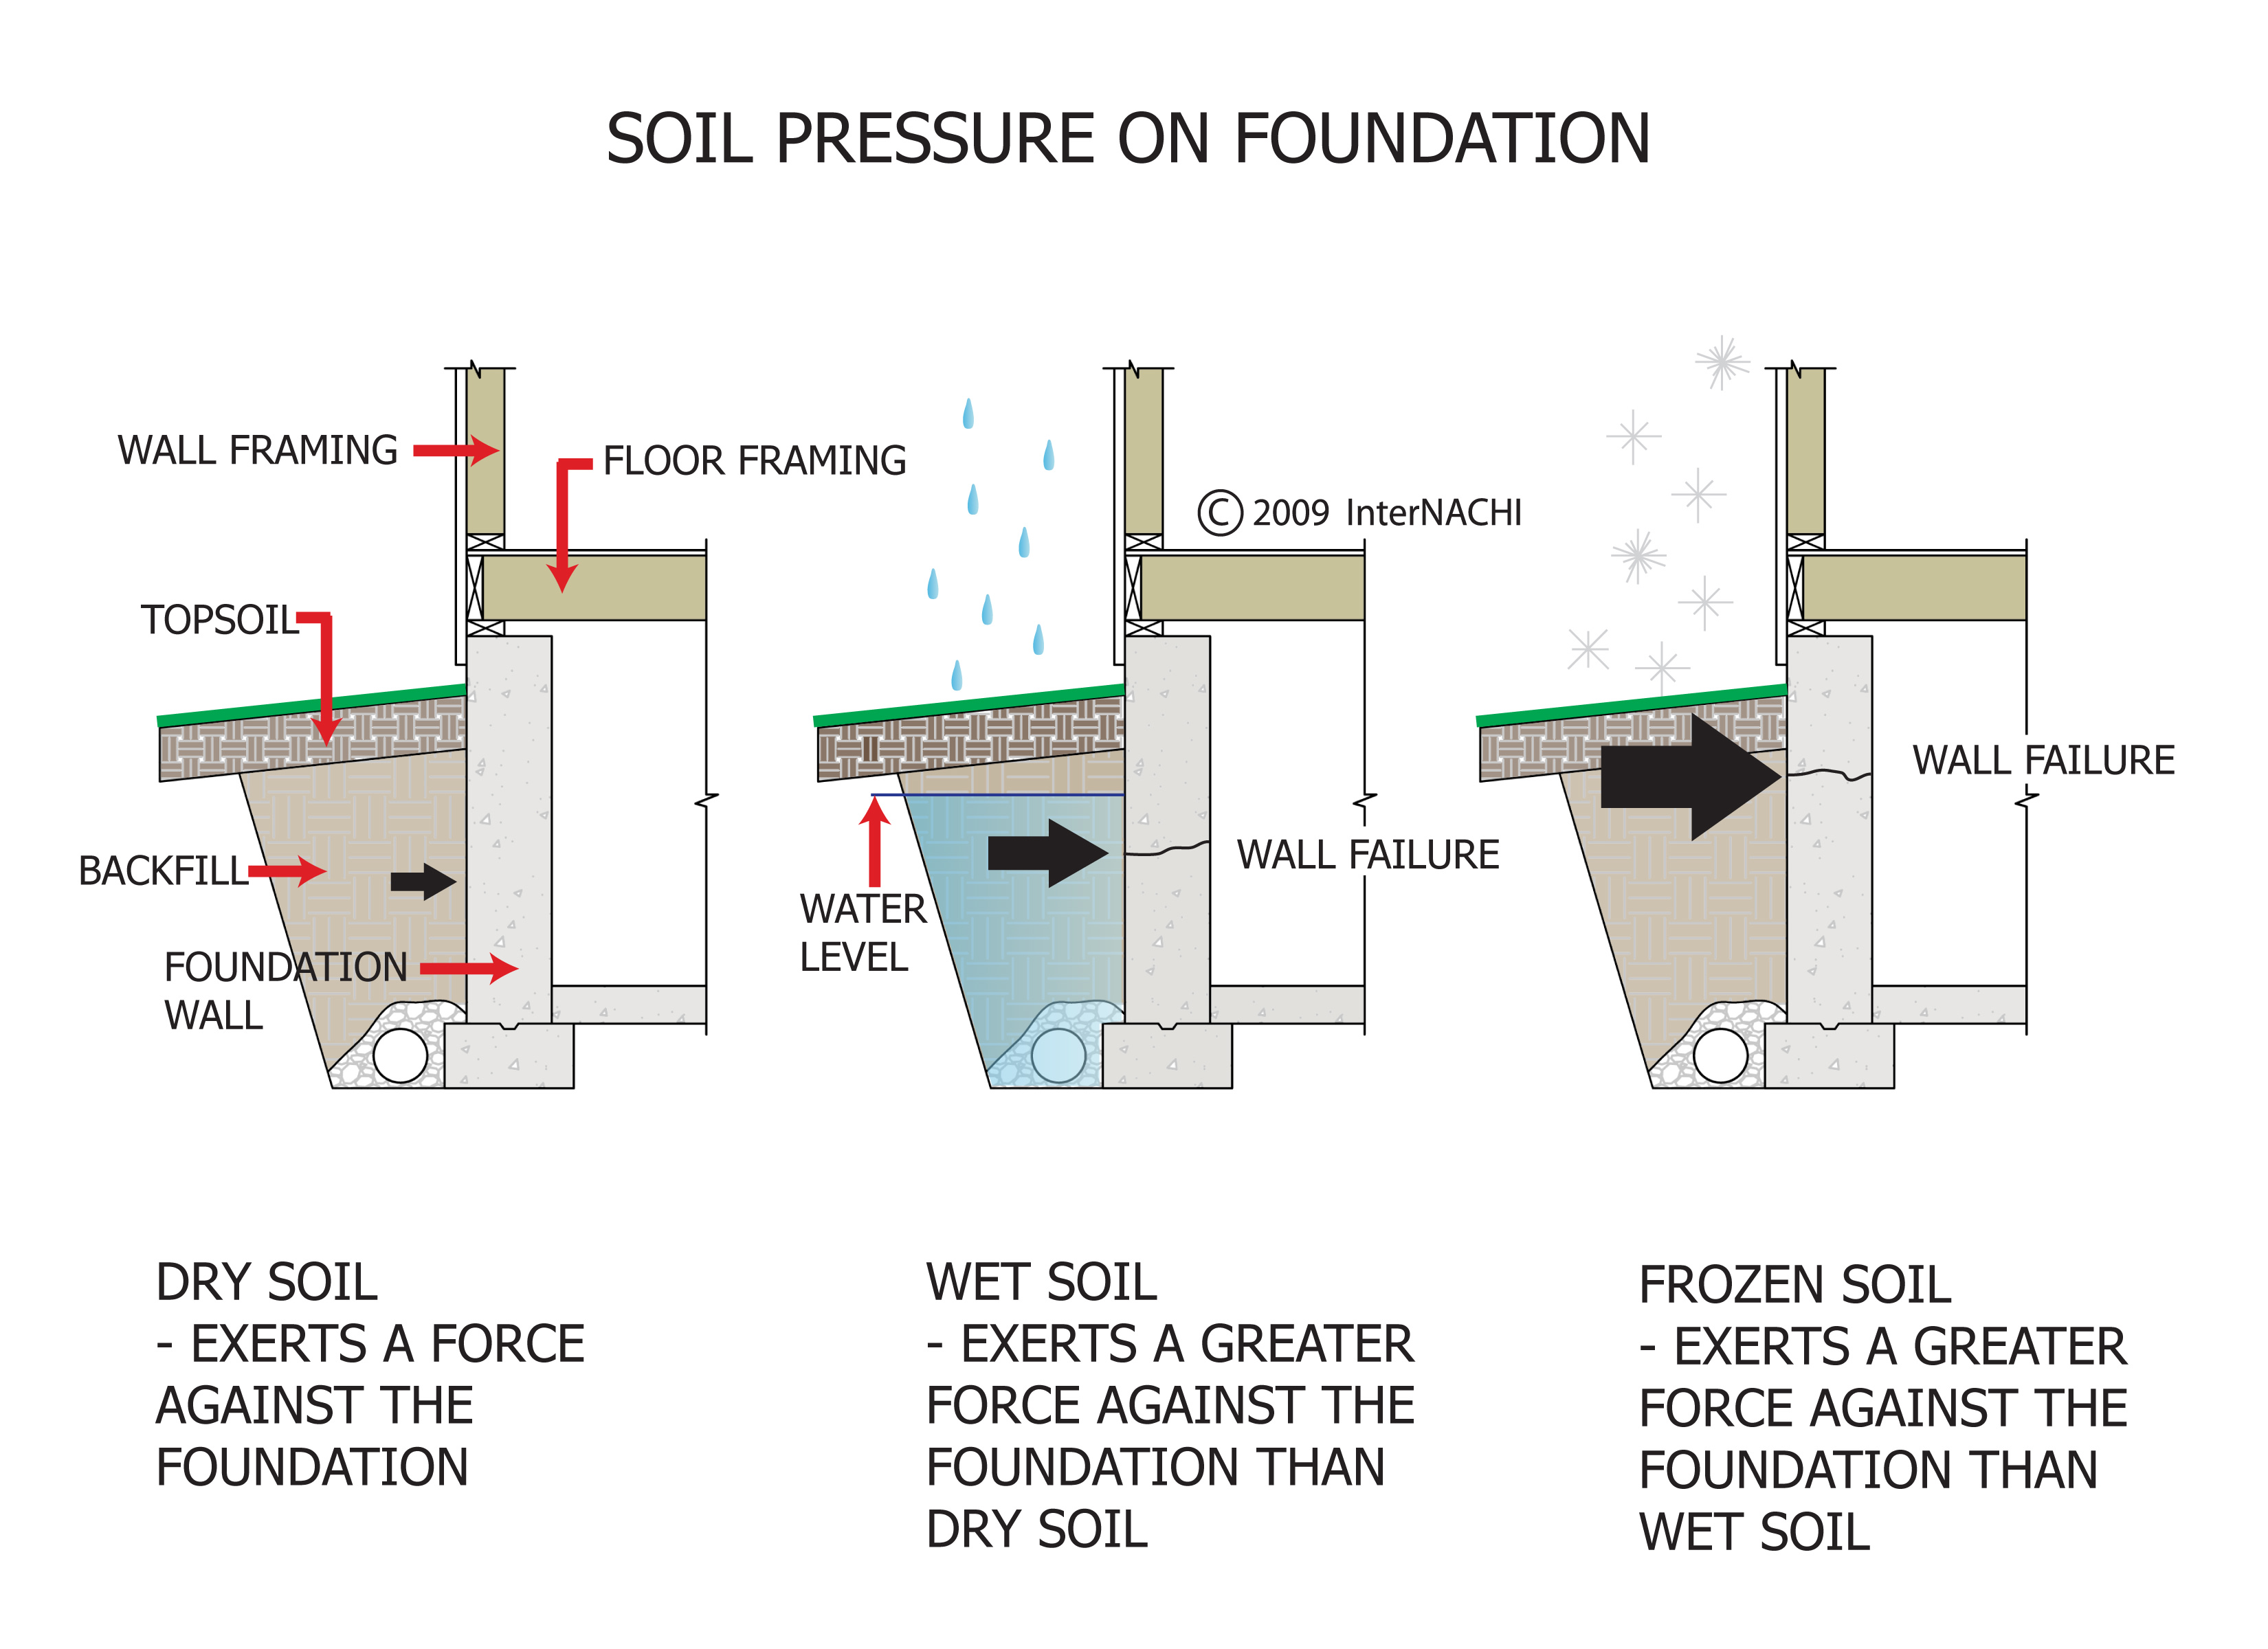 Soil pressure on foundation walls.